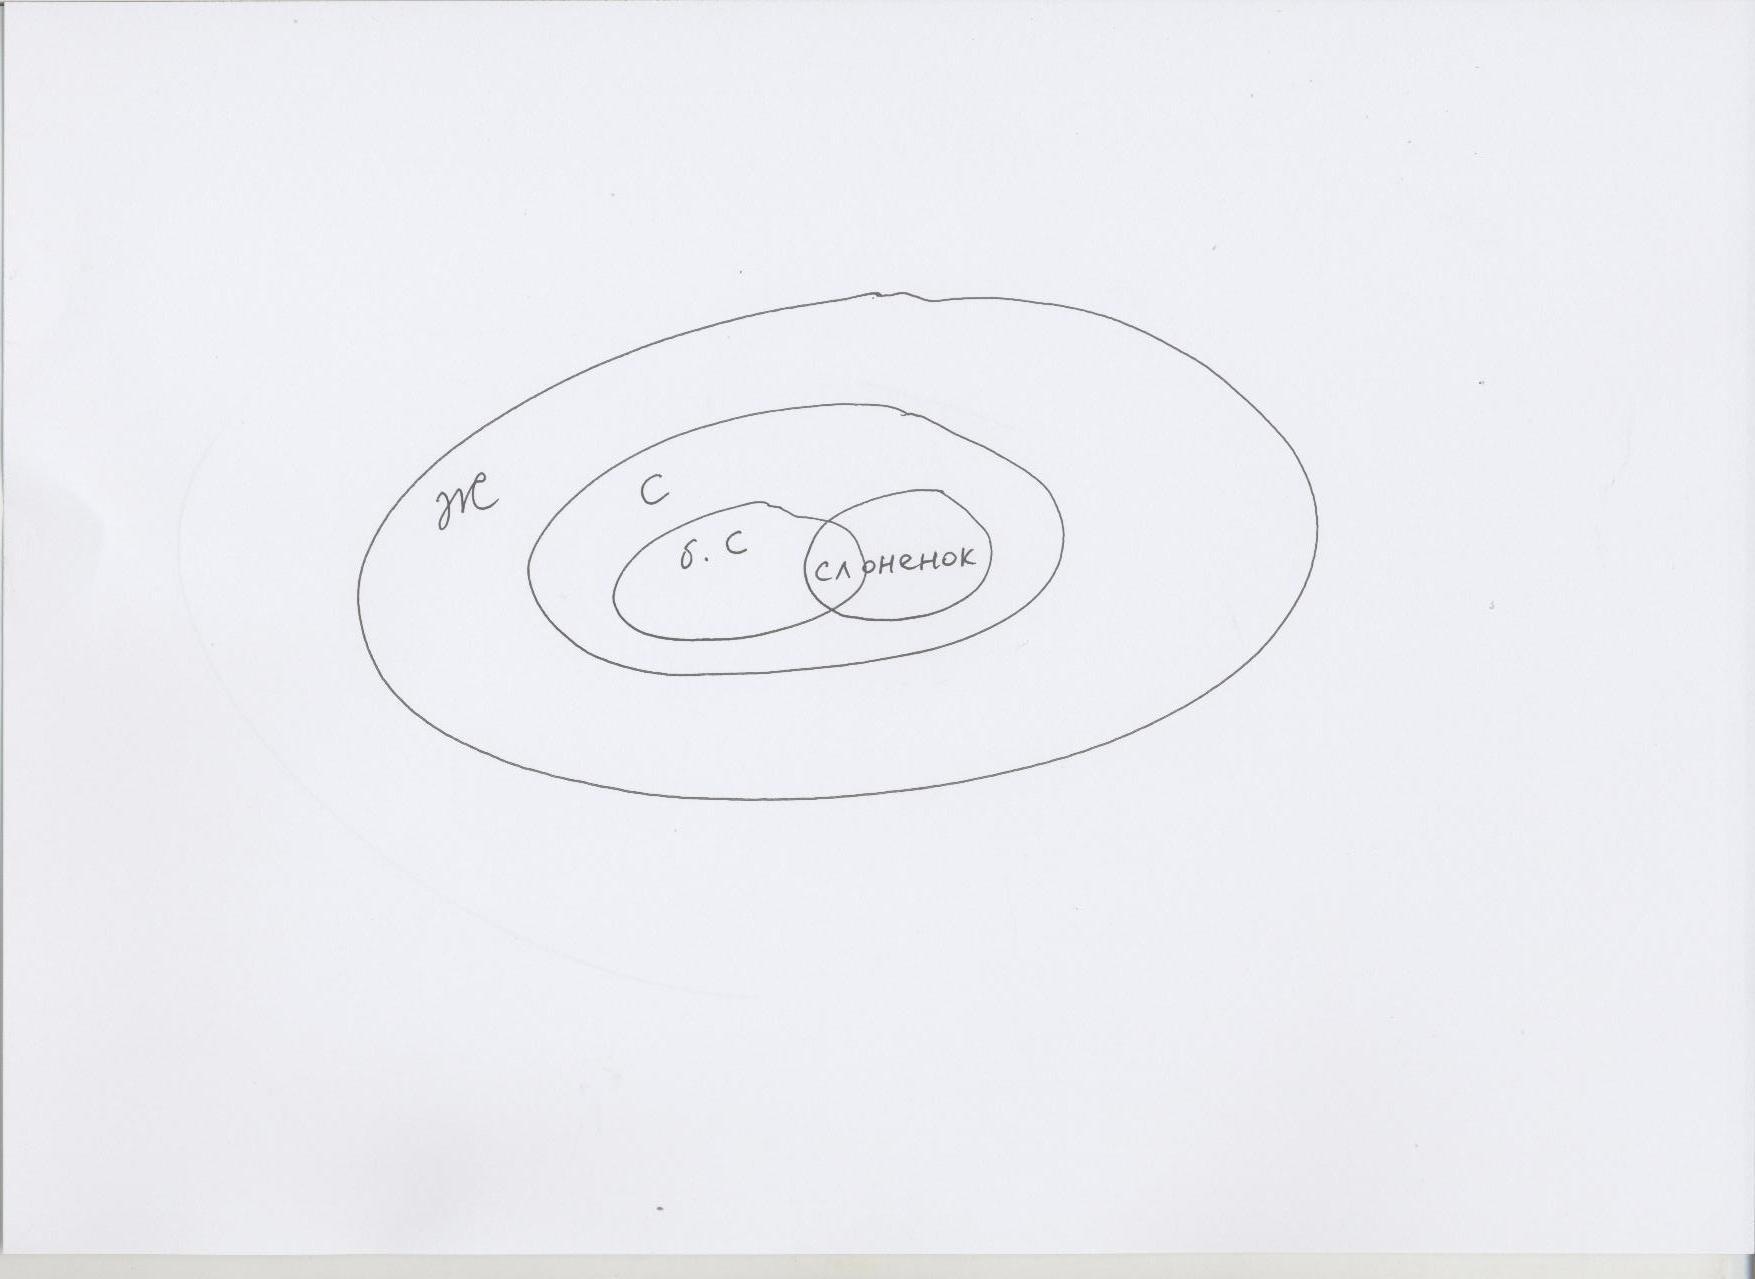 C:\Documents and Settings\teacher\Рабочий стол\Бугрышева\cccccc 002.jpg